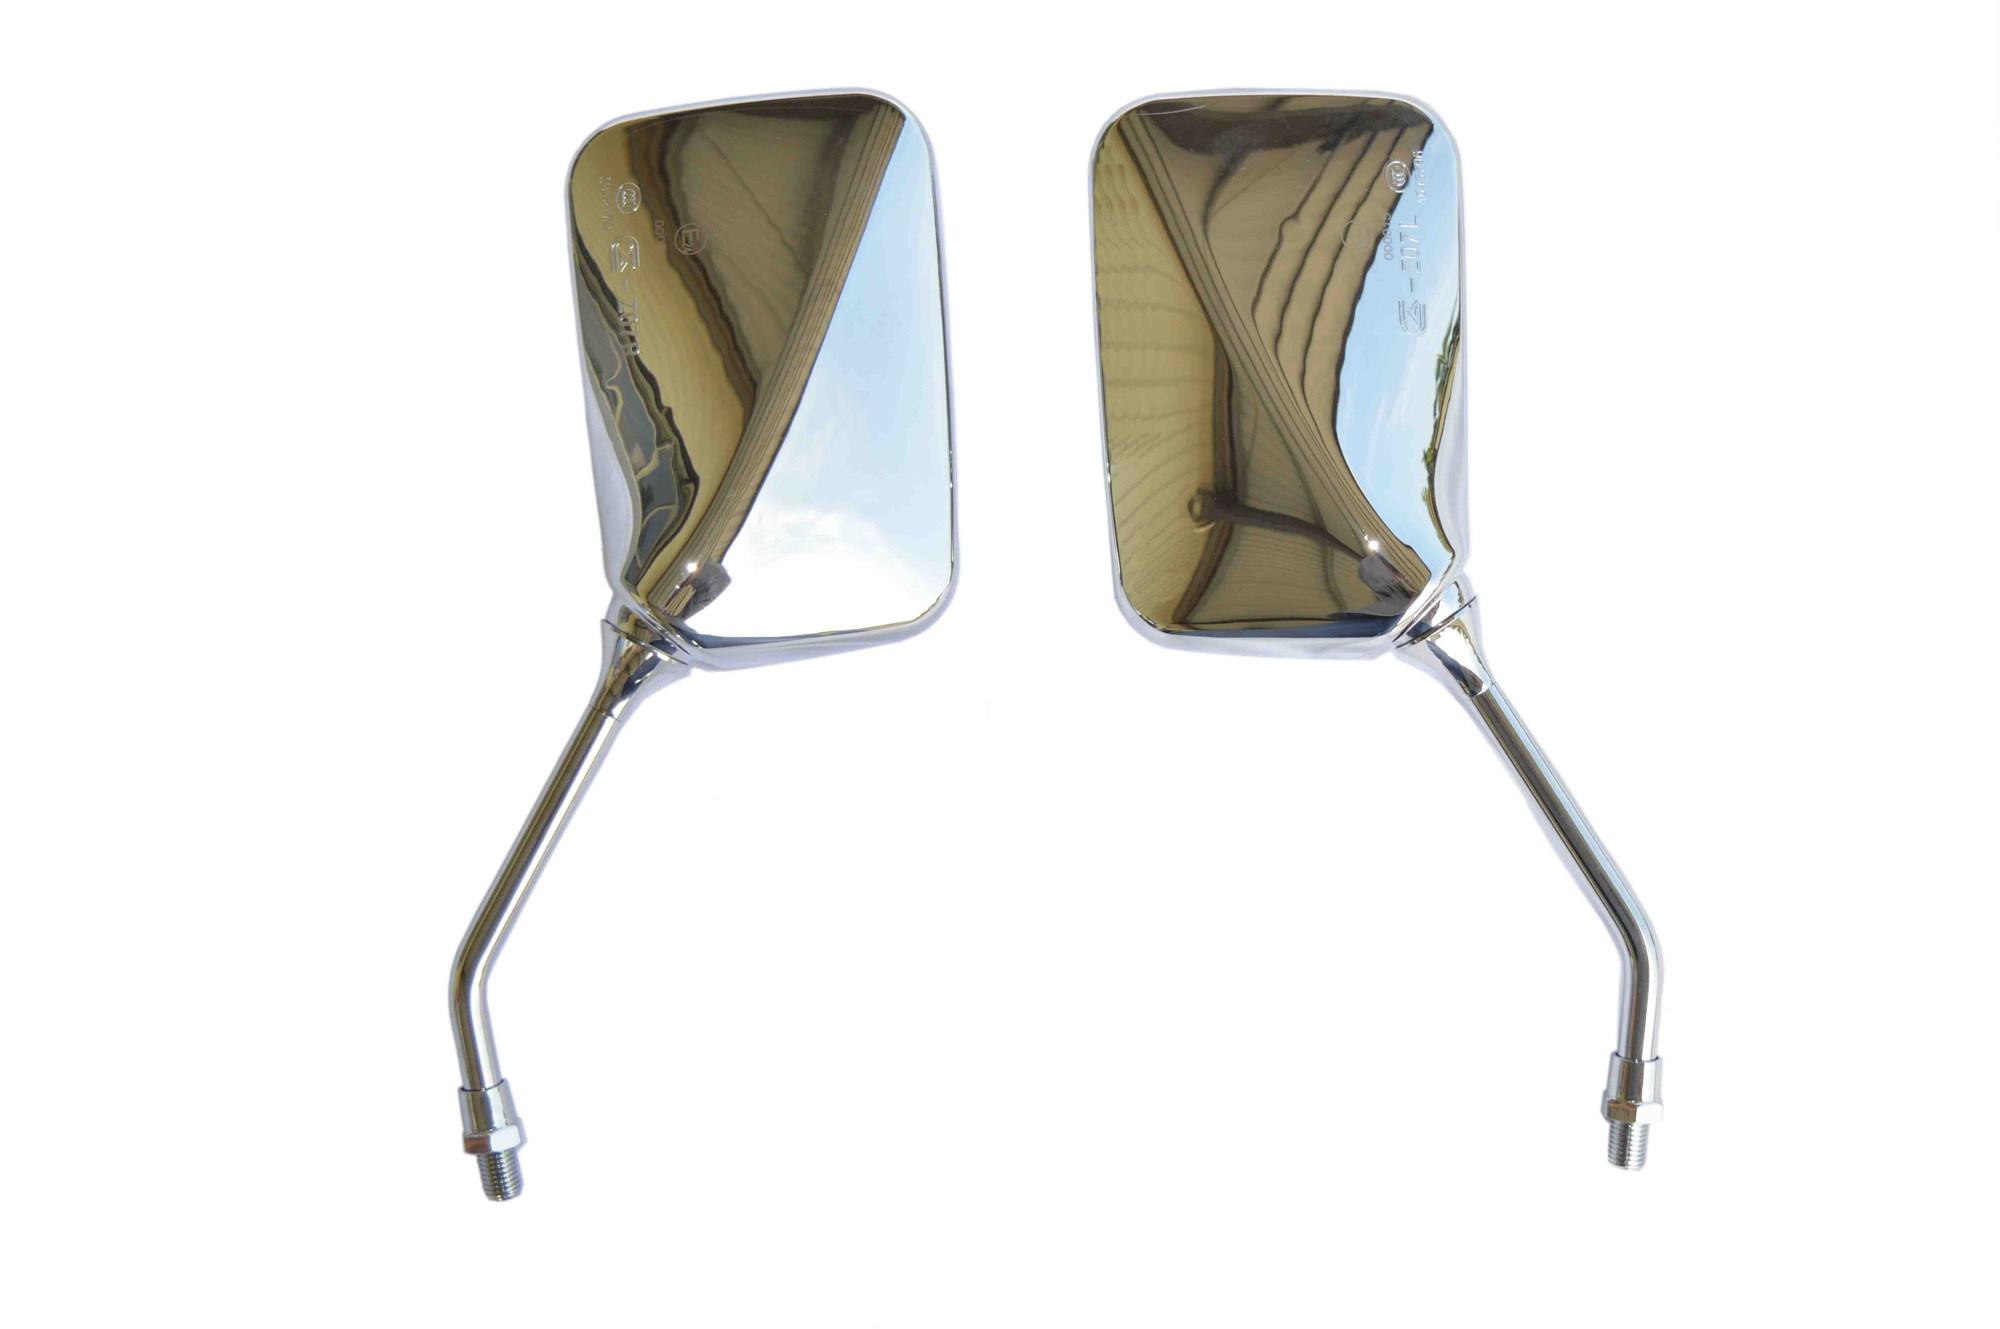 Manufactory Motorcycle Spare Parts (Mirror)